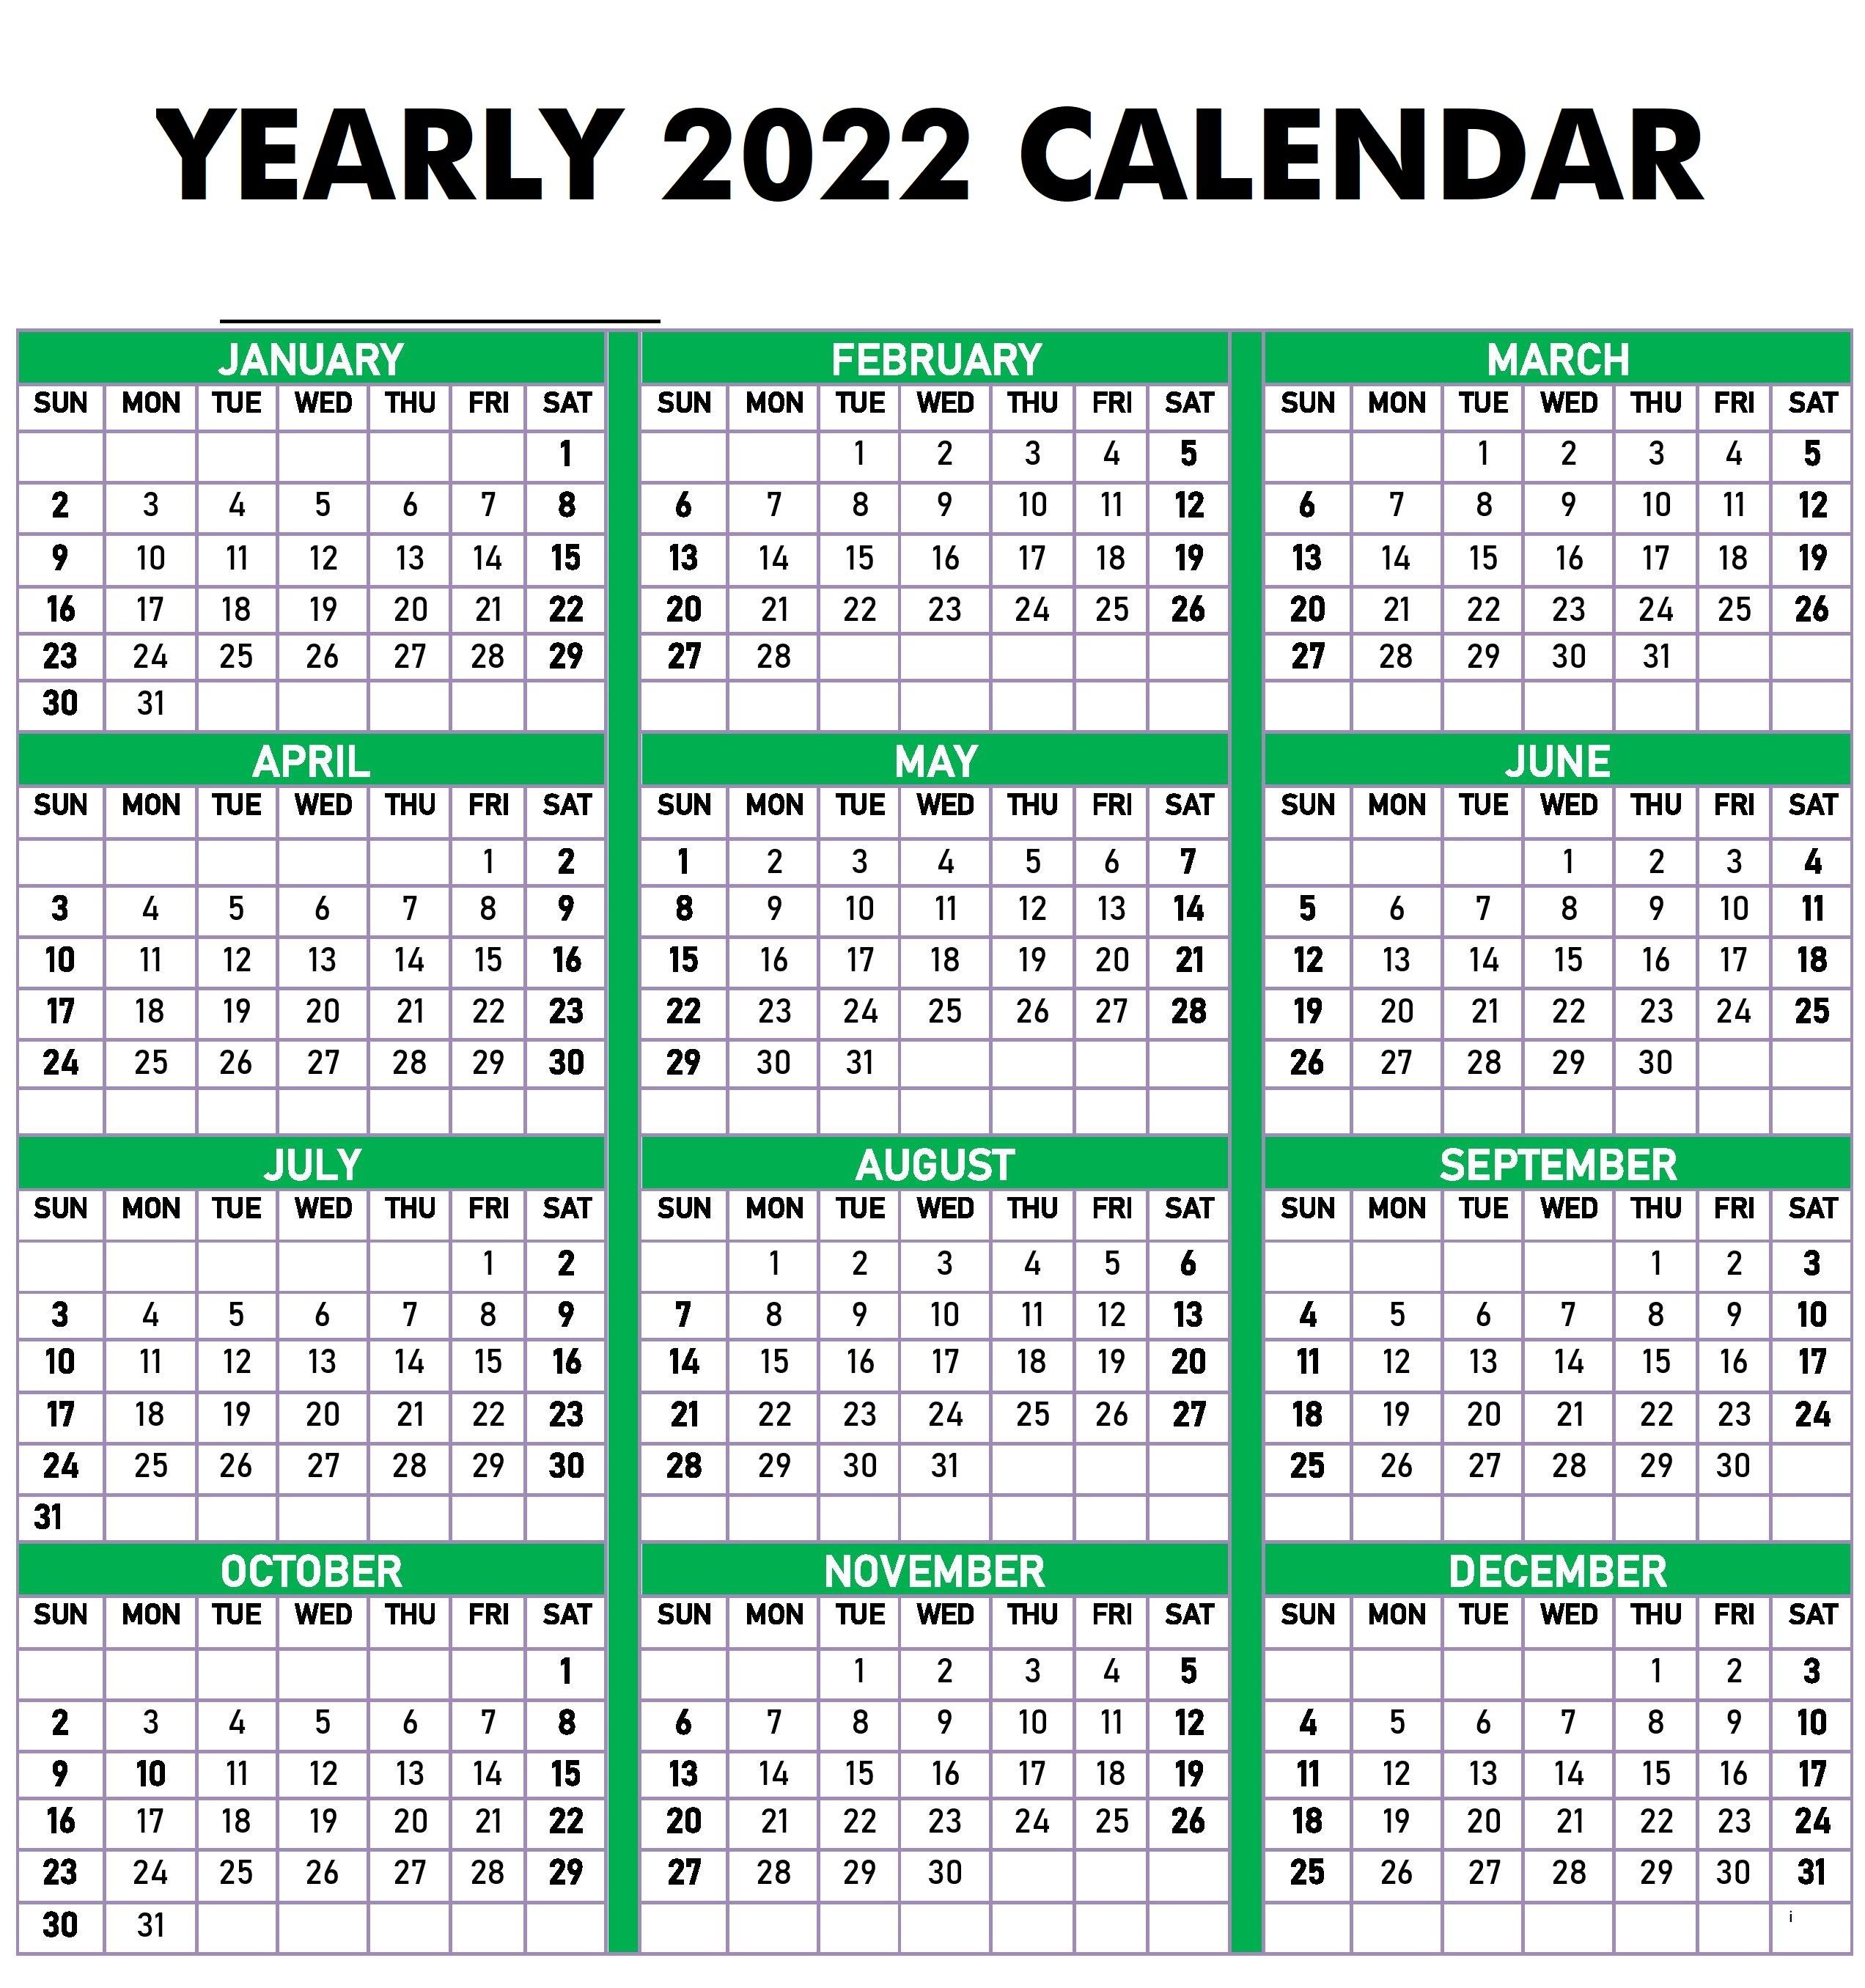 Printable 2022 Calendar PDF.jpg